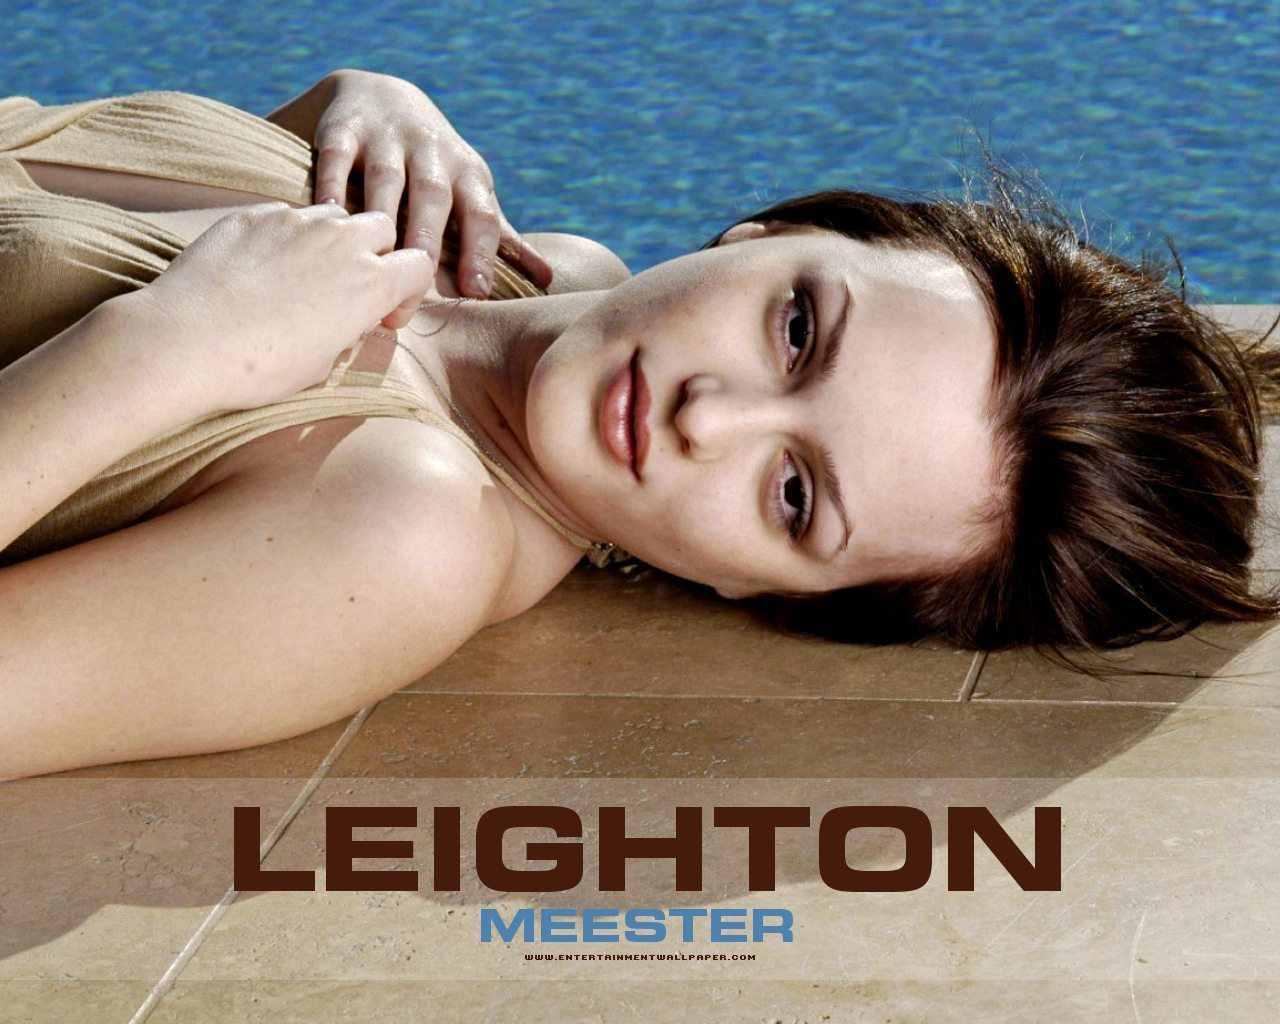 http://1.bp.blogspot.com/-qbZz4mqsWsY/Ti6wxj46XoI/AAAAAAAAKLQ/EXjOqHW-aGw/s1600/Leighton-Meester-leighton-meester-2115761-1280-1024.jpg